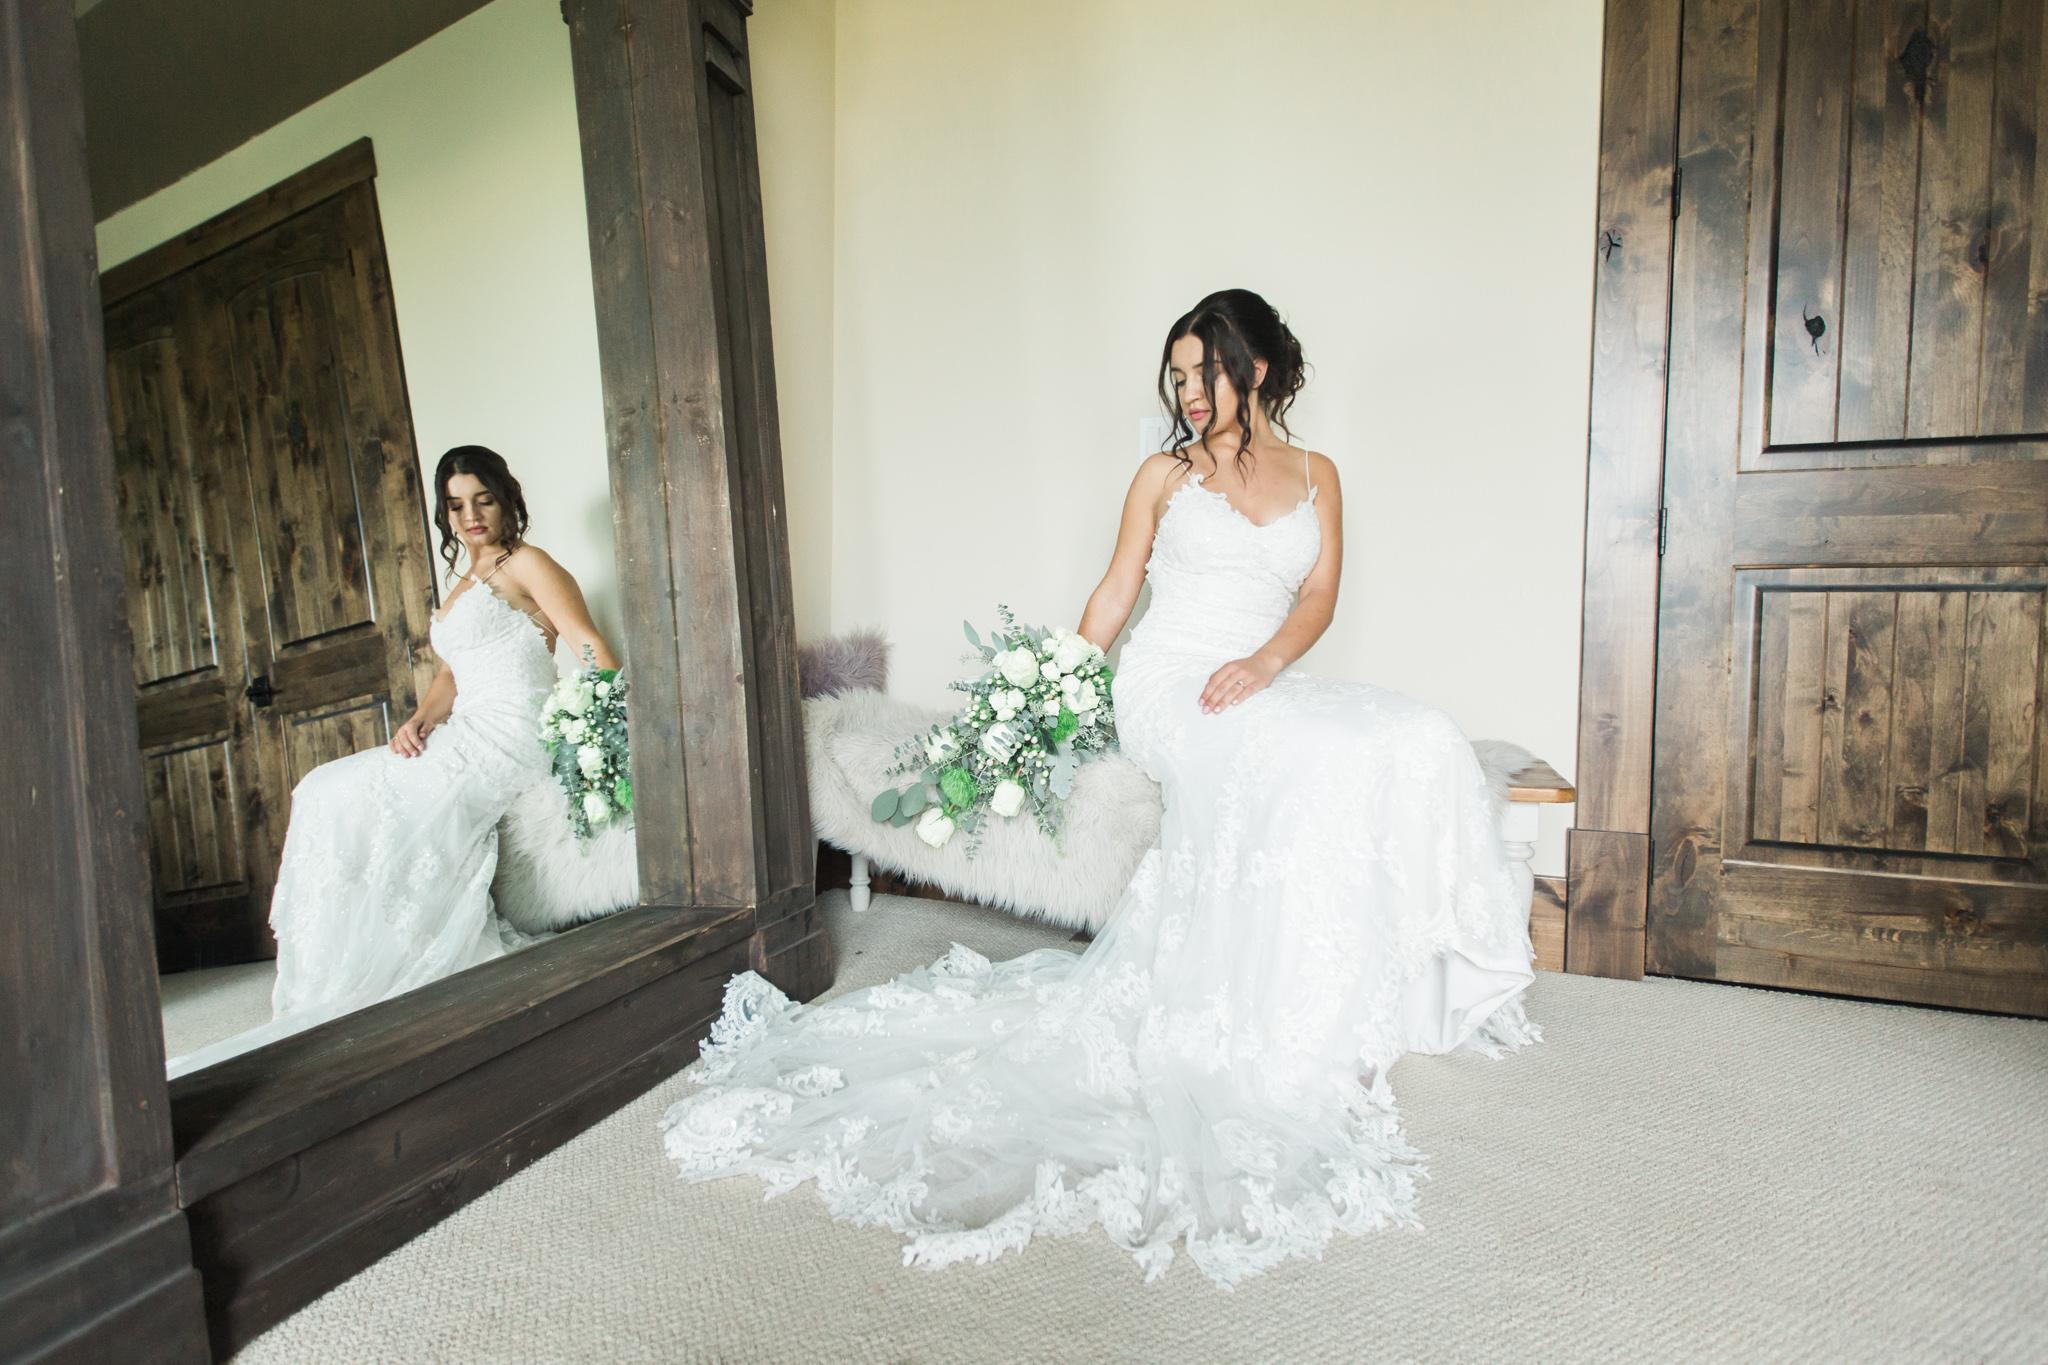 Olga_janni_wedding_090917_WEBSIZE (105 of 704).JPG